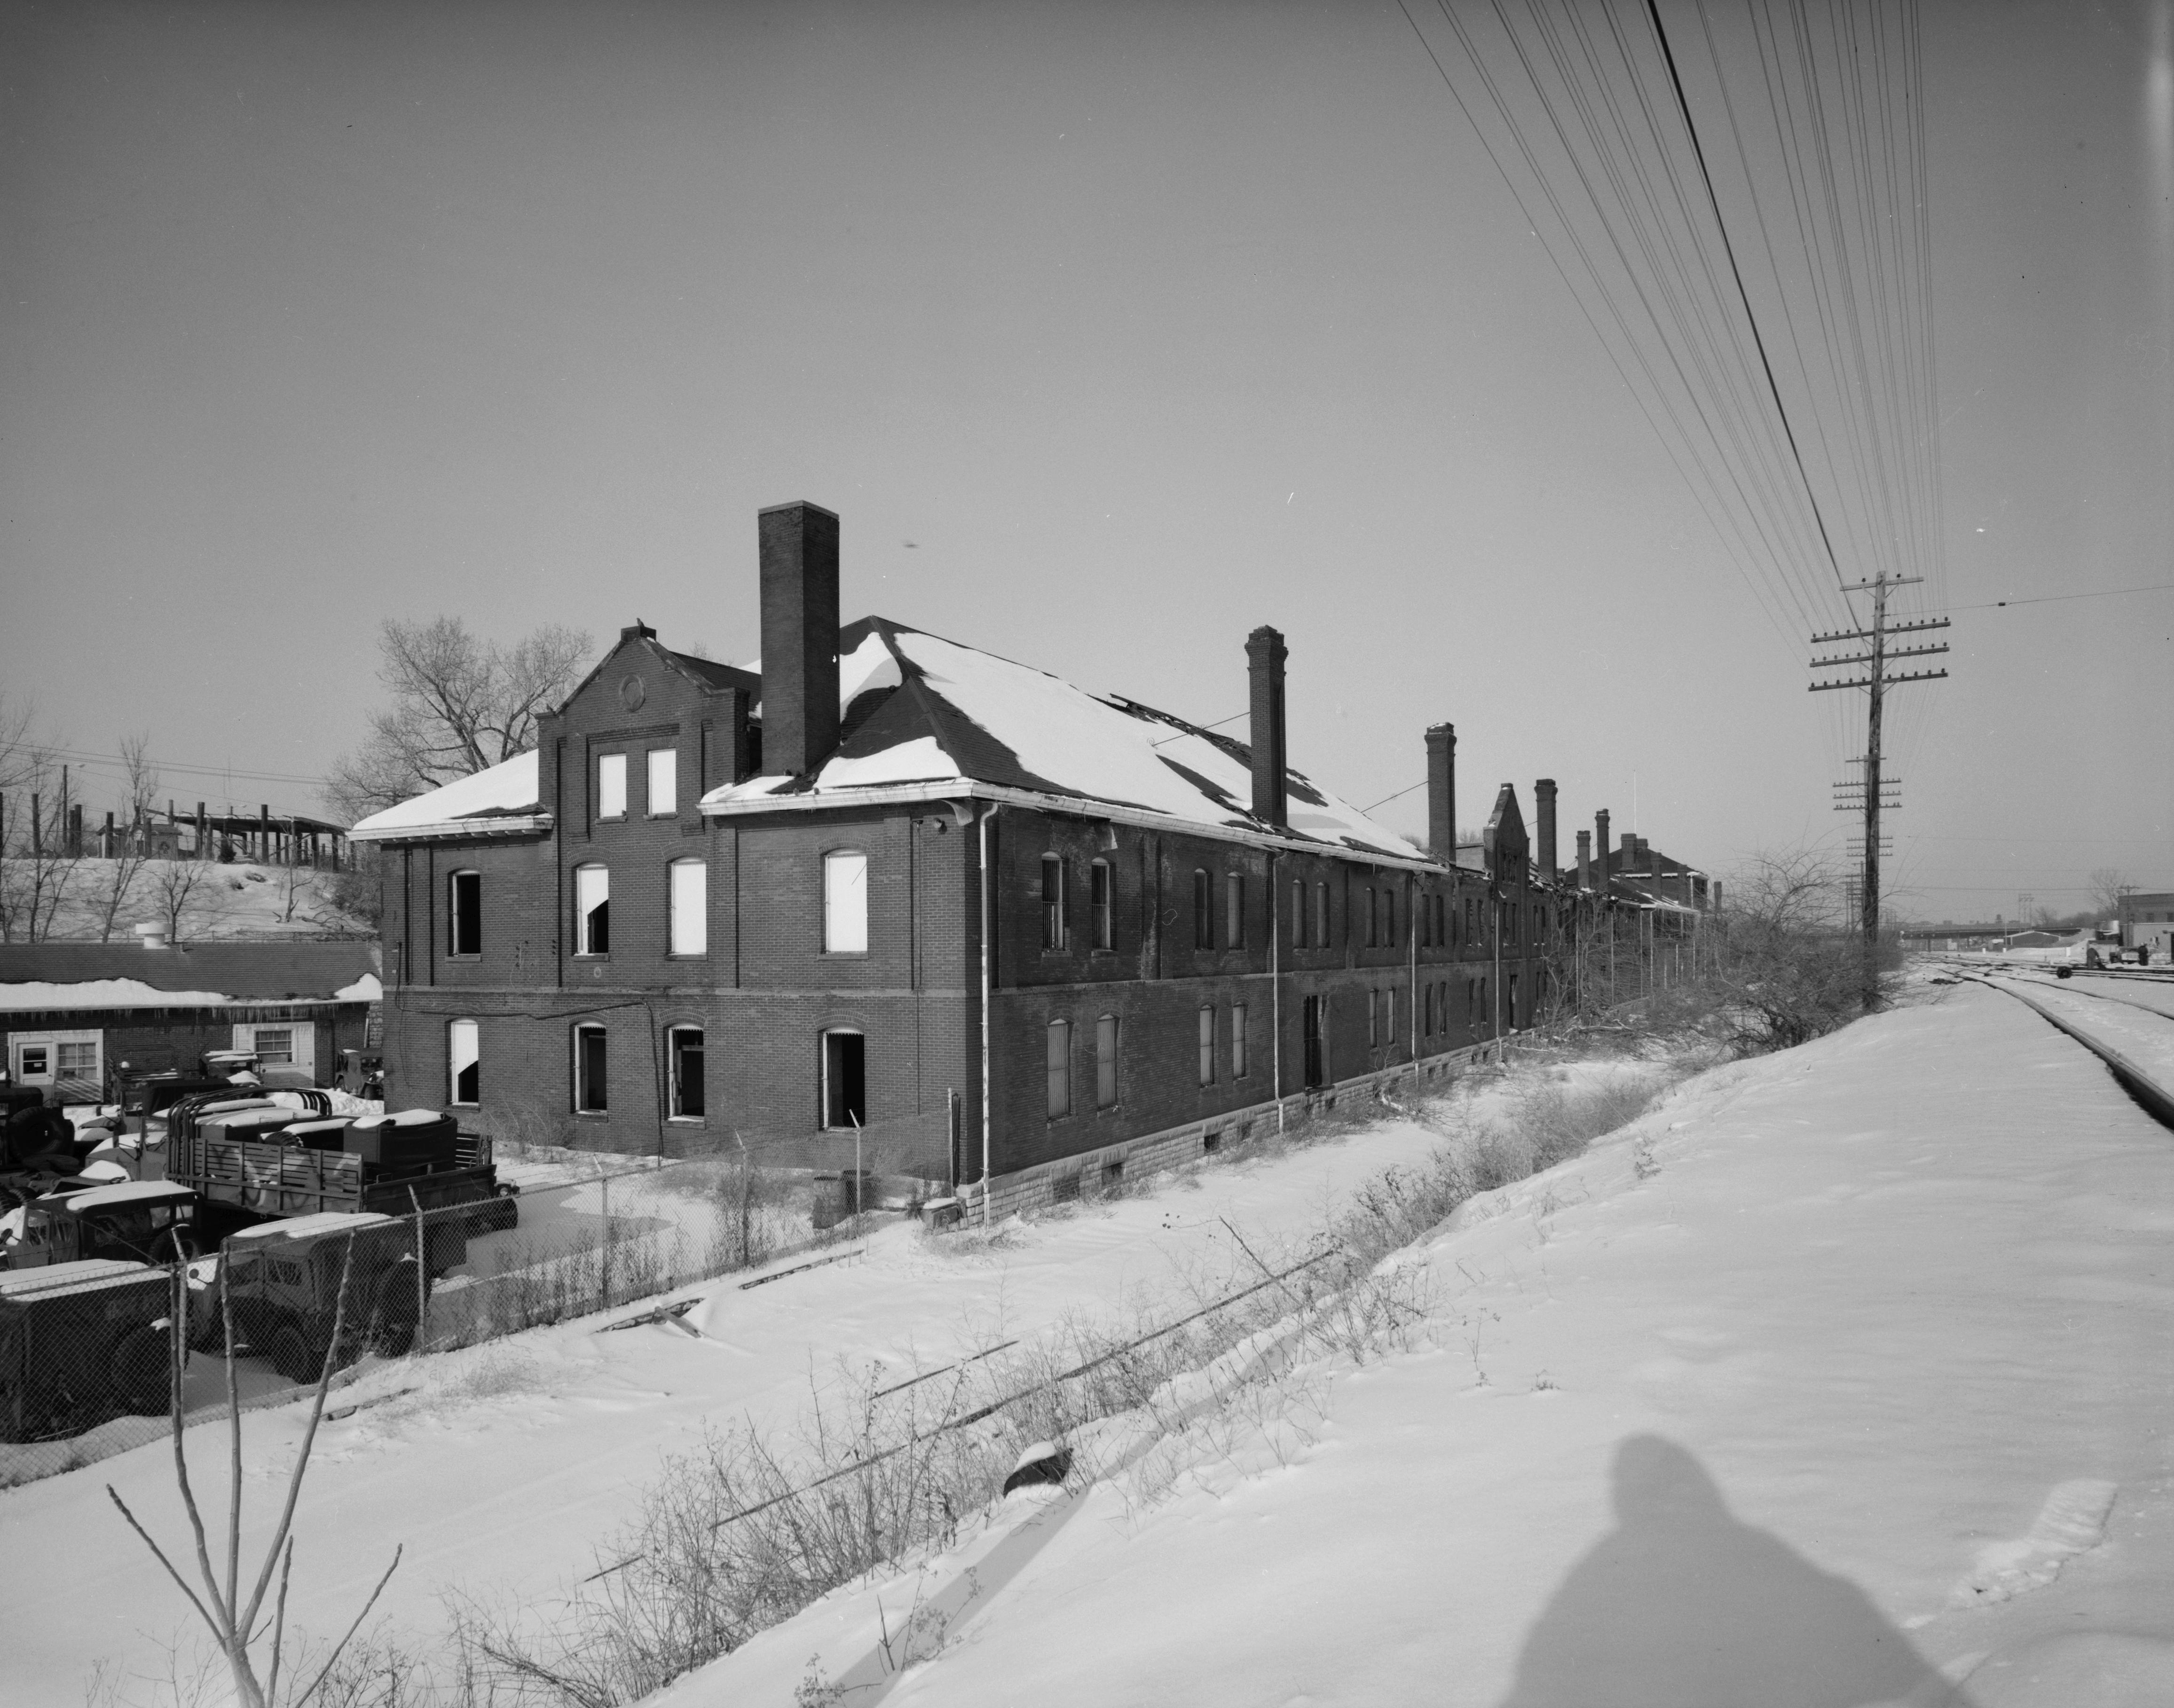 omaha quartermaster depot historic district wikipedia